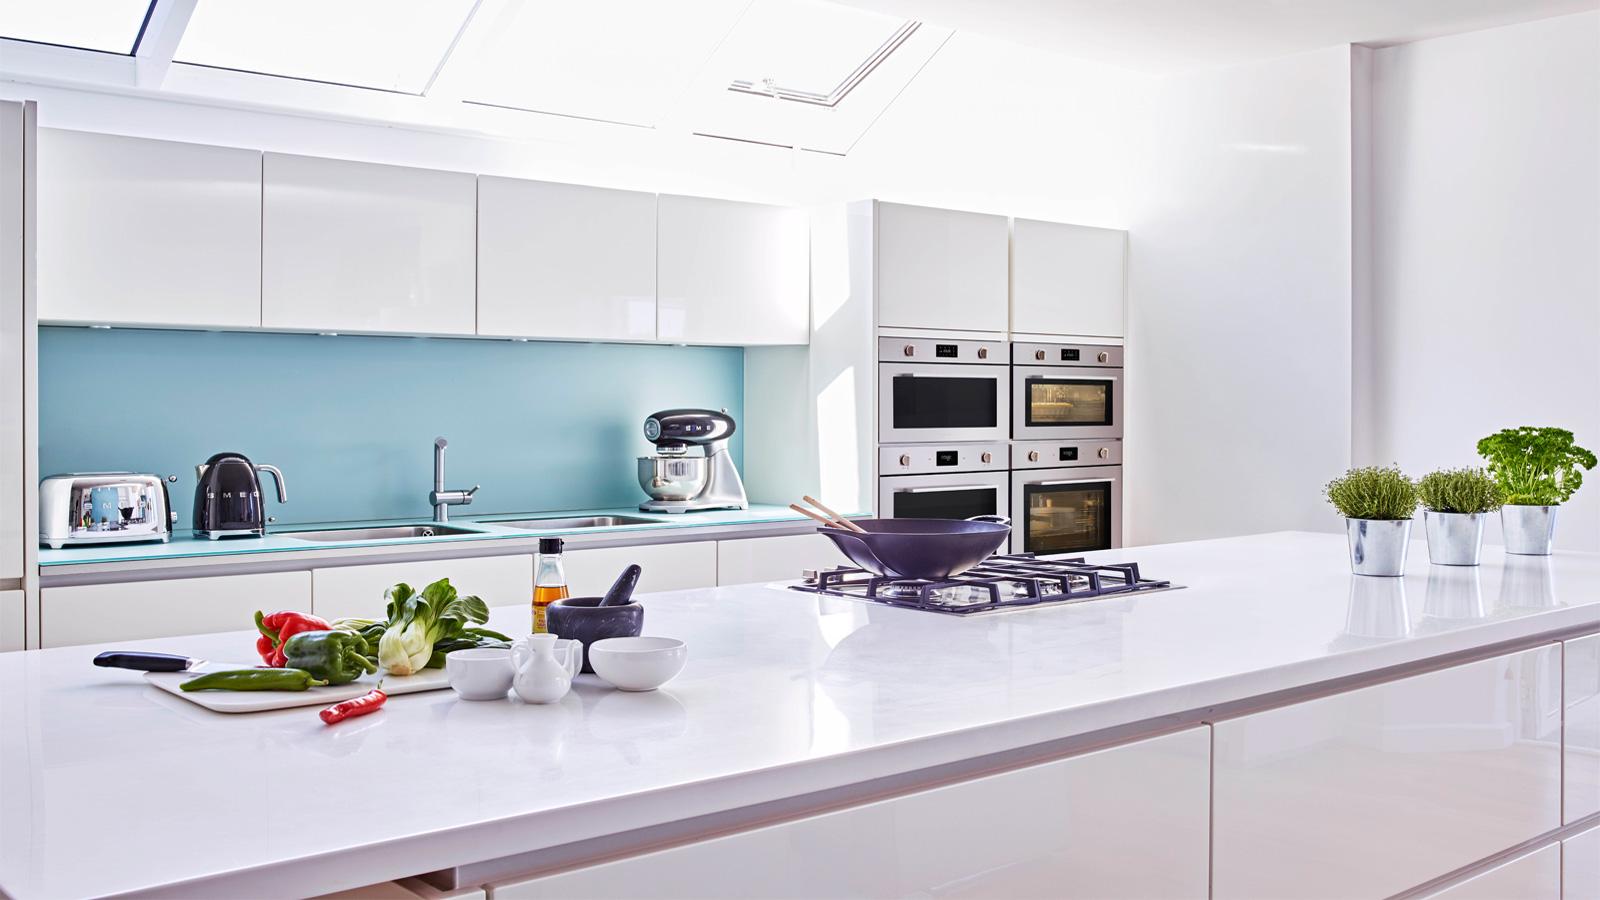 Smeg revamps Cucina oven range 3